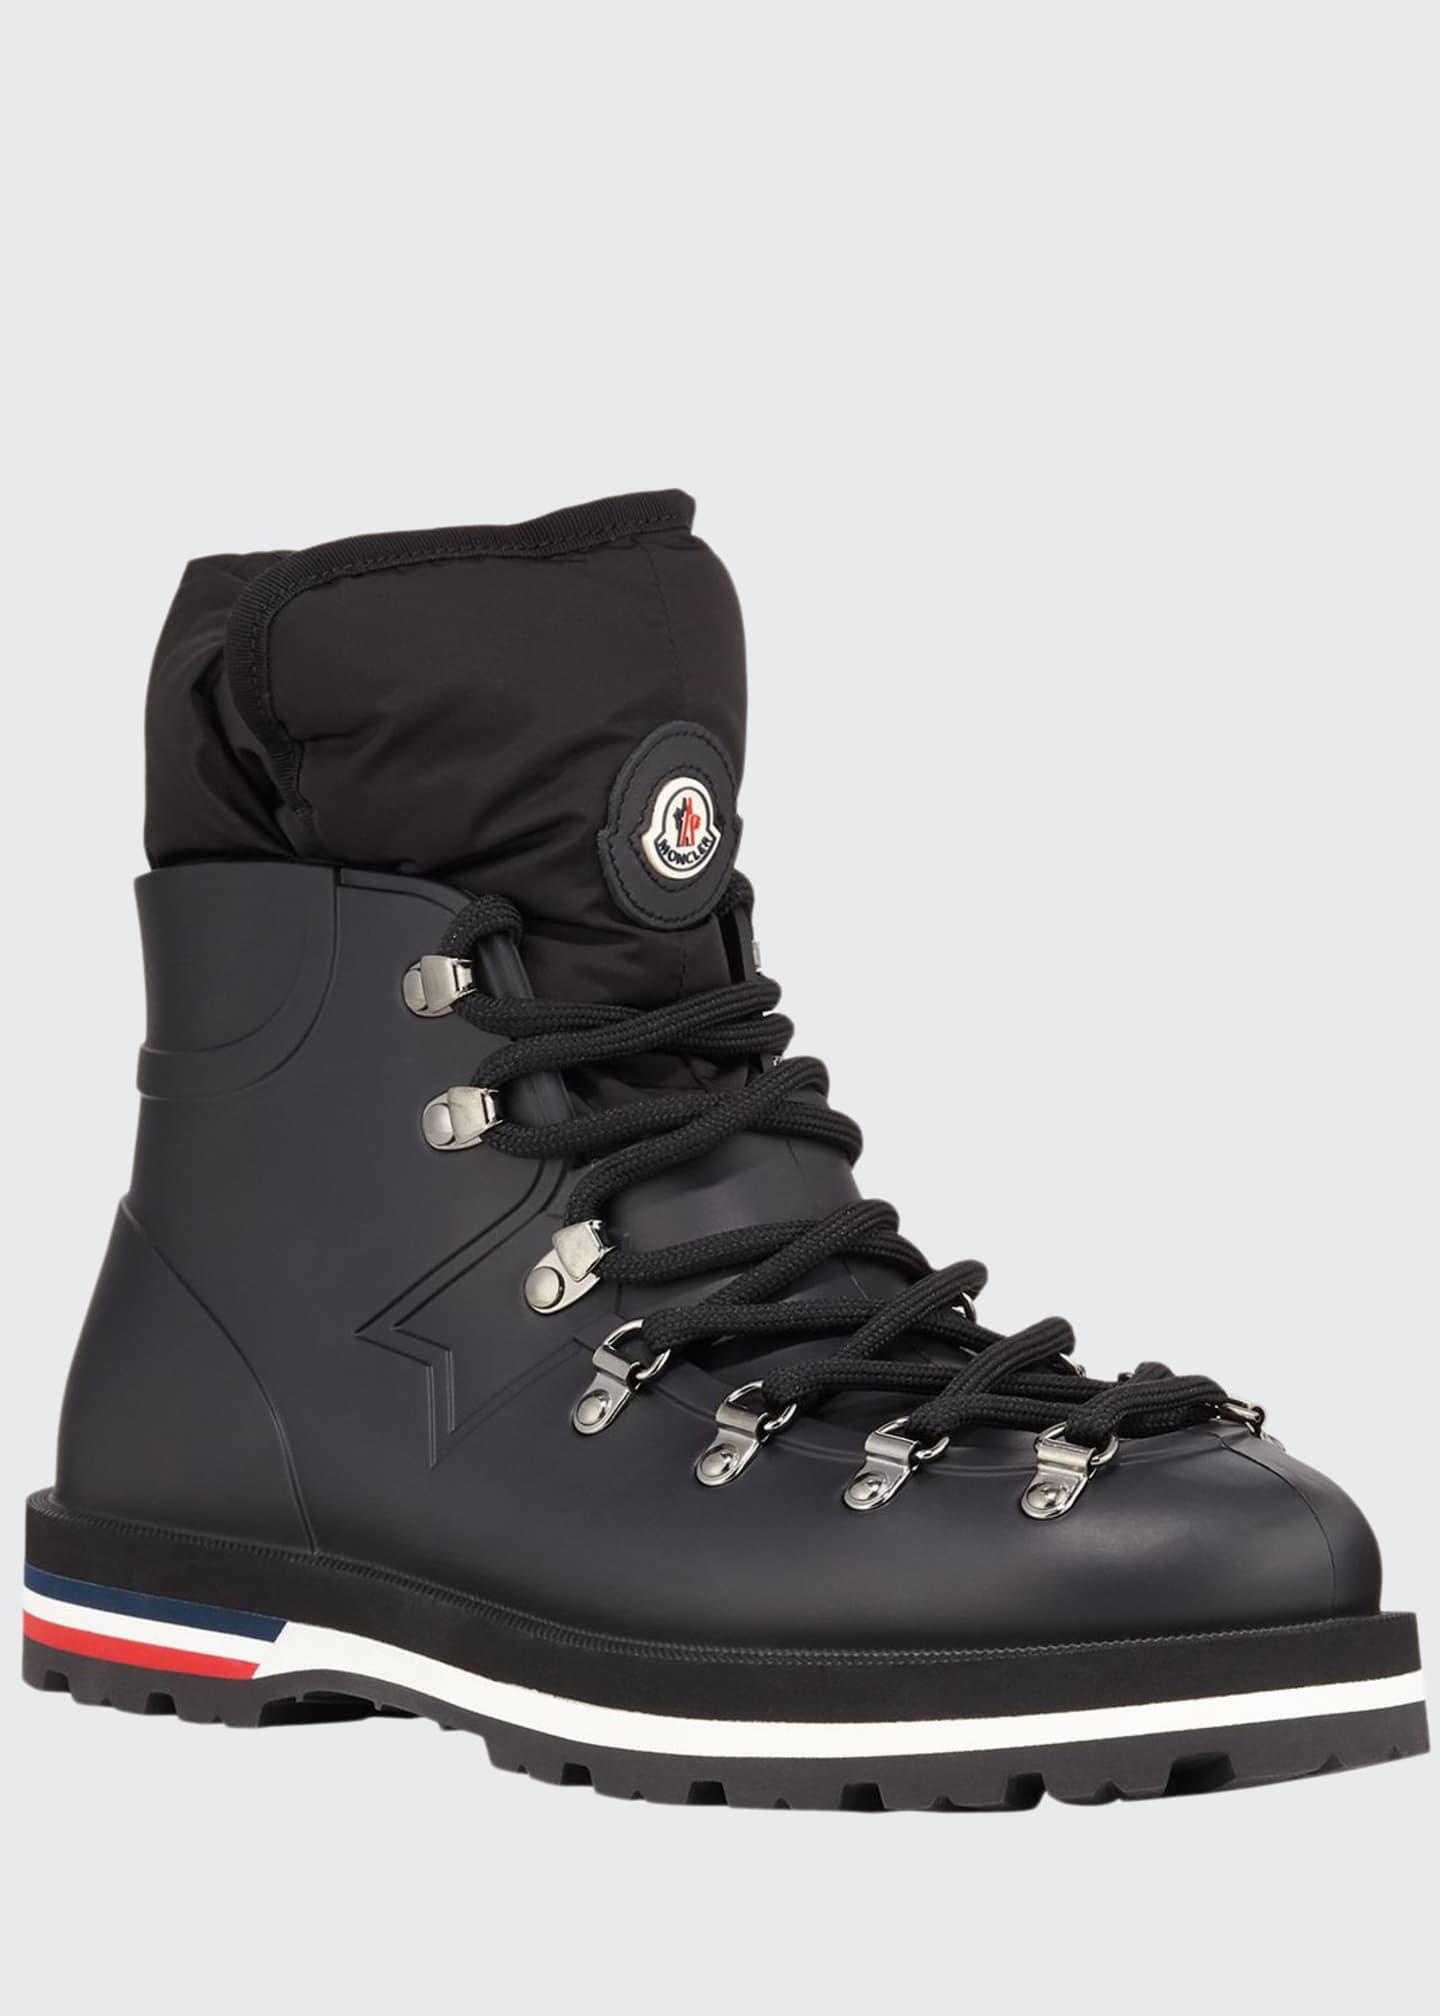 Moncler Inaya Scarpa Rubber Boots